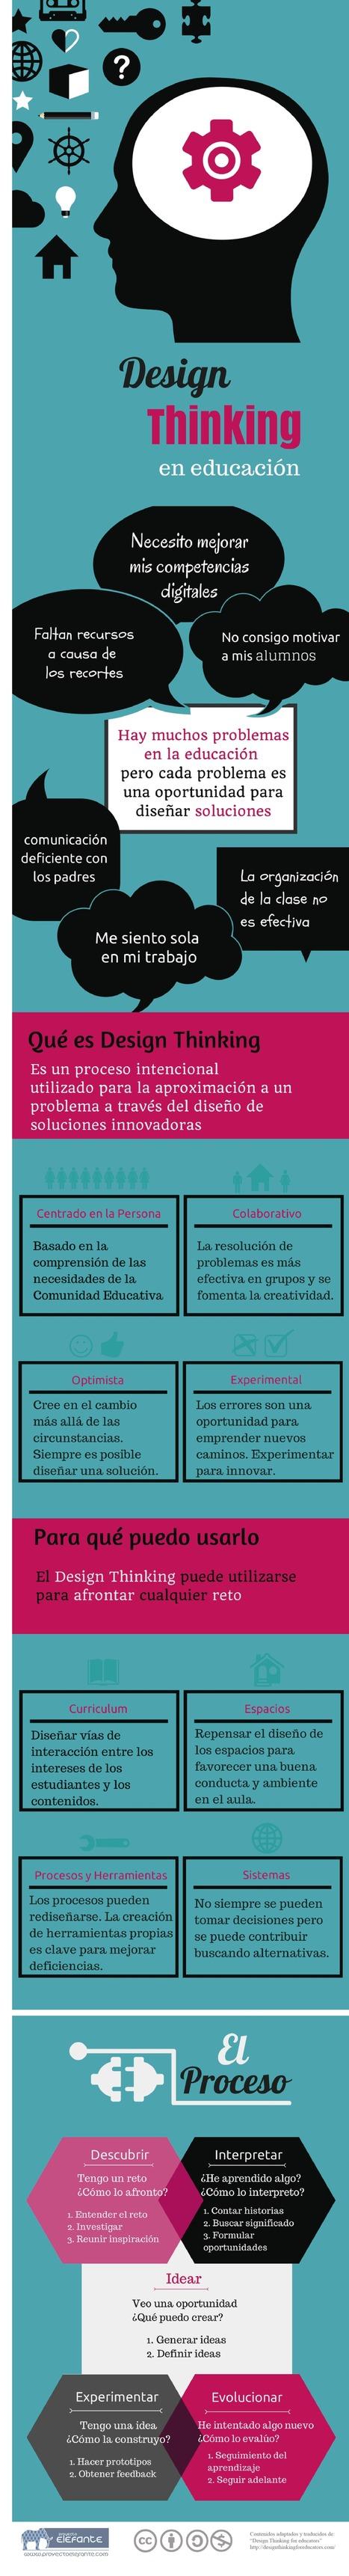 Design Thinking para la educación #infografia #infographic #education   Innovation and creativity   Scoop.it